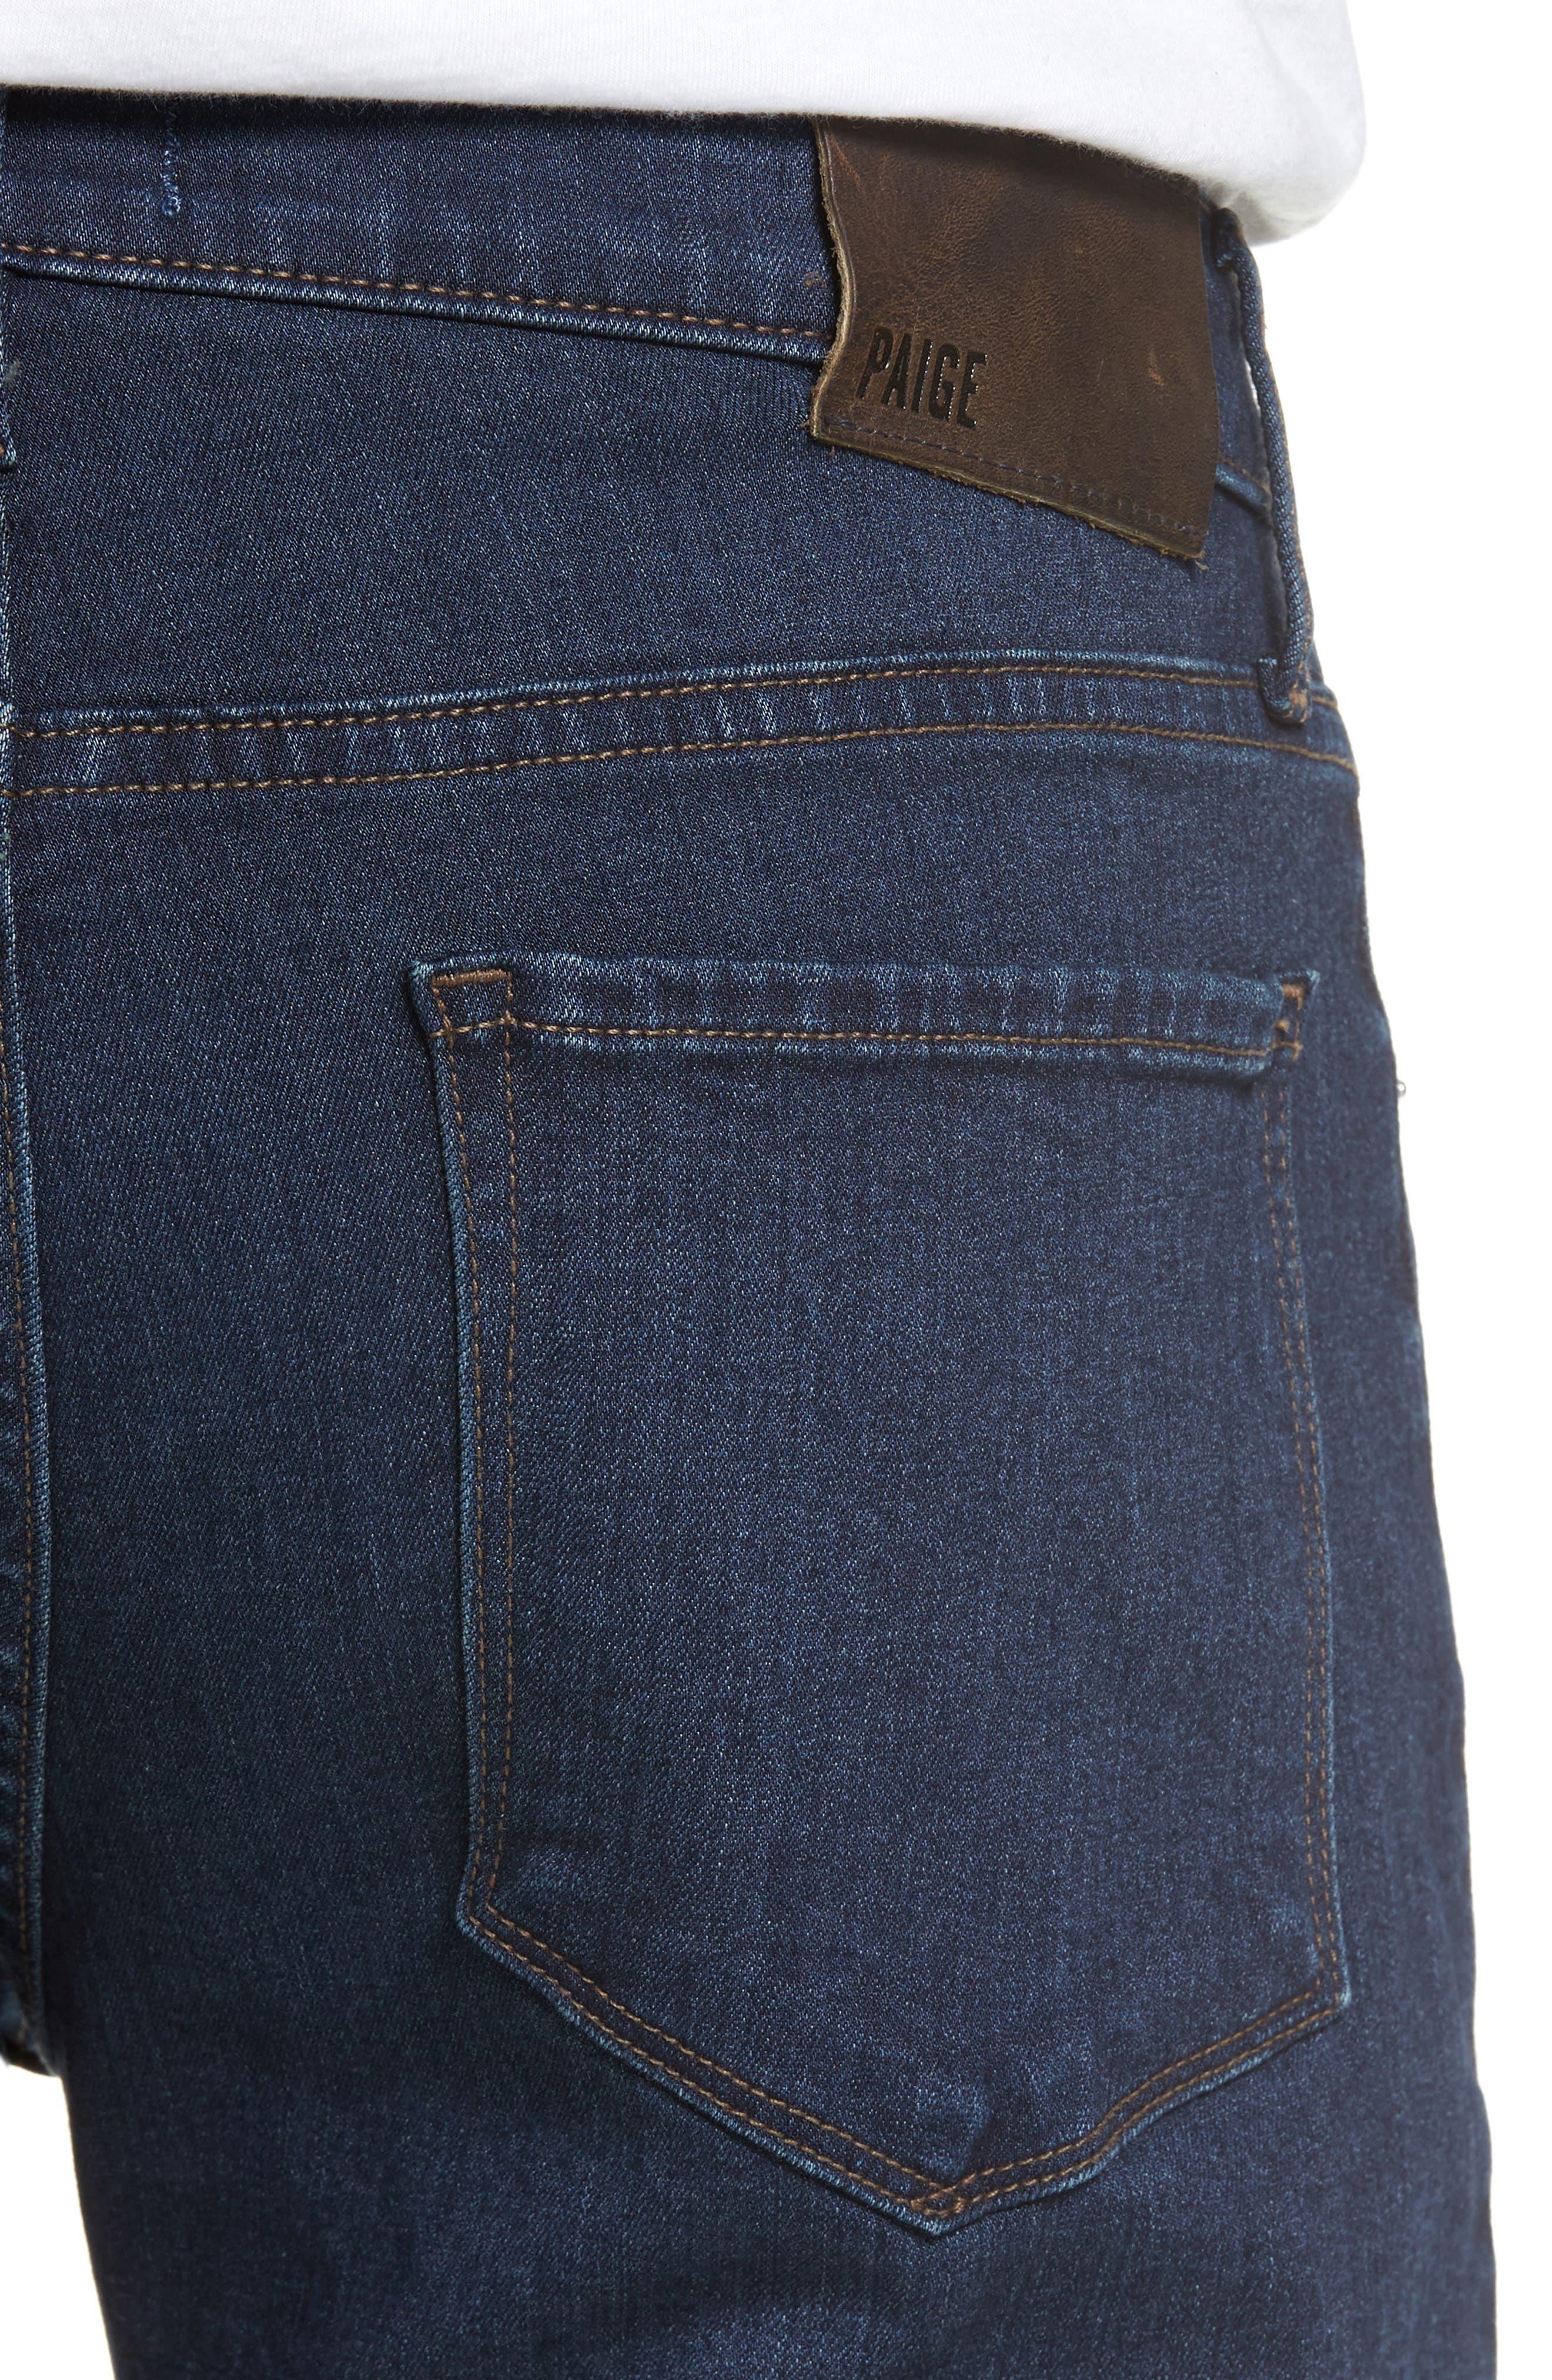 Normandie Straight Leg Jeans,                             Alternate thumbnail 4, color,                             400